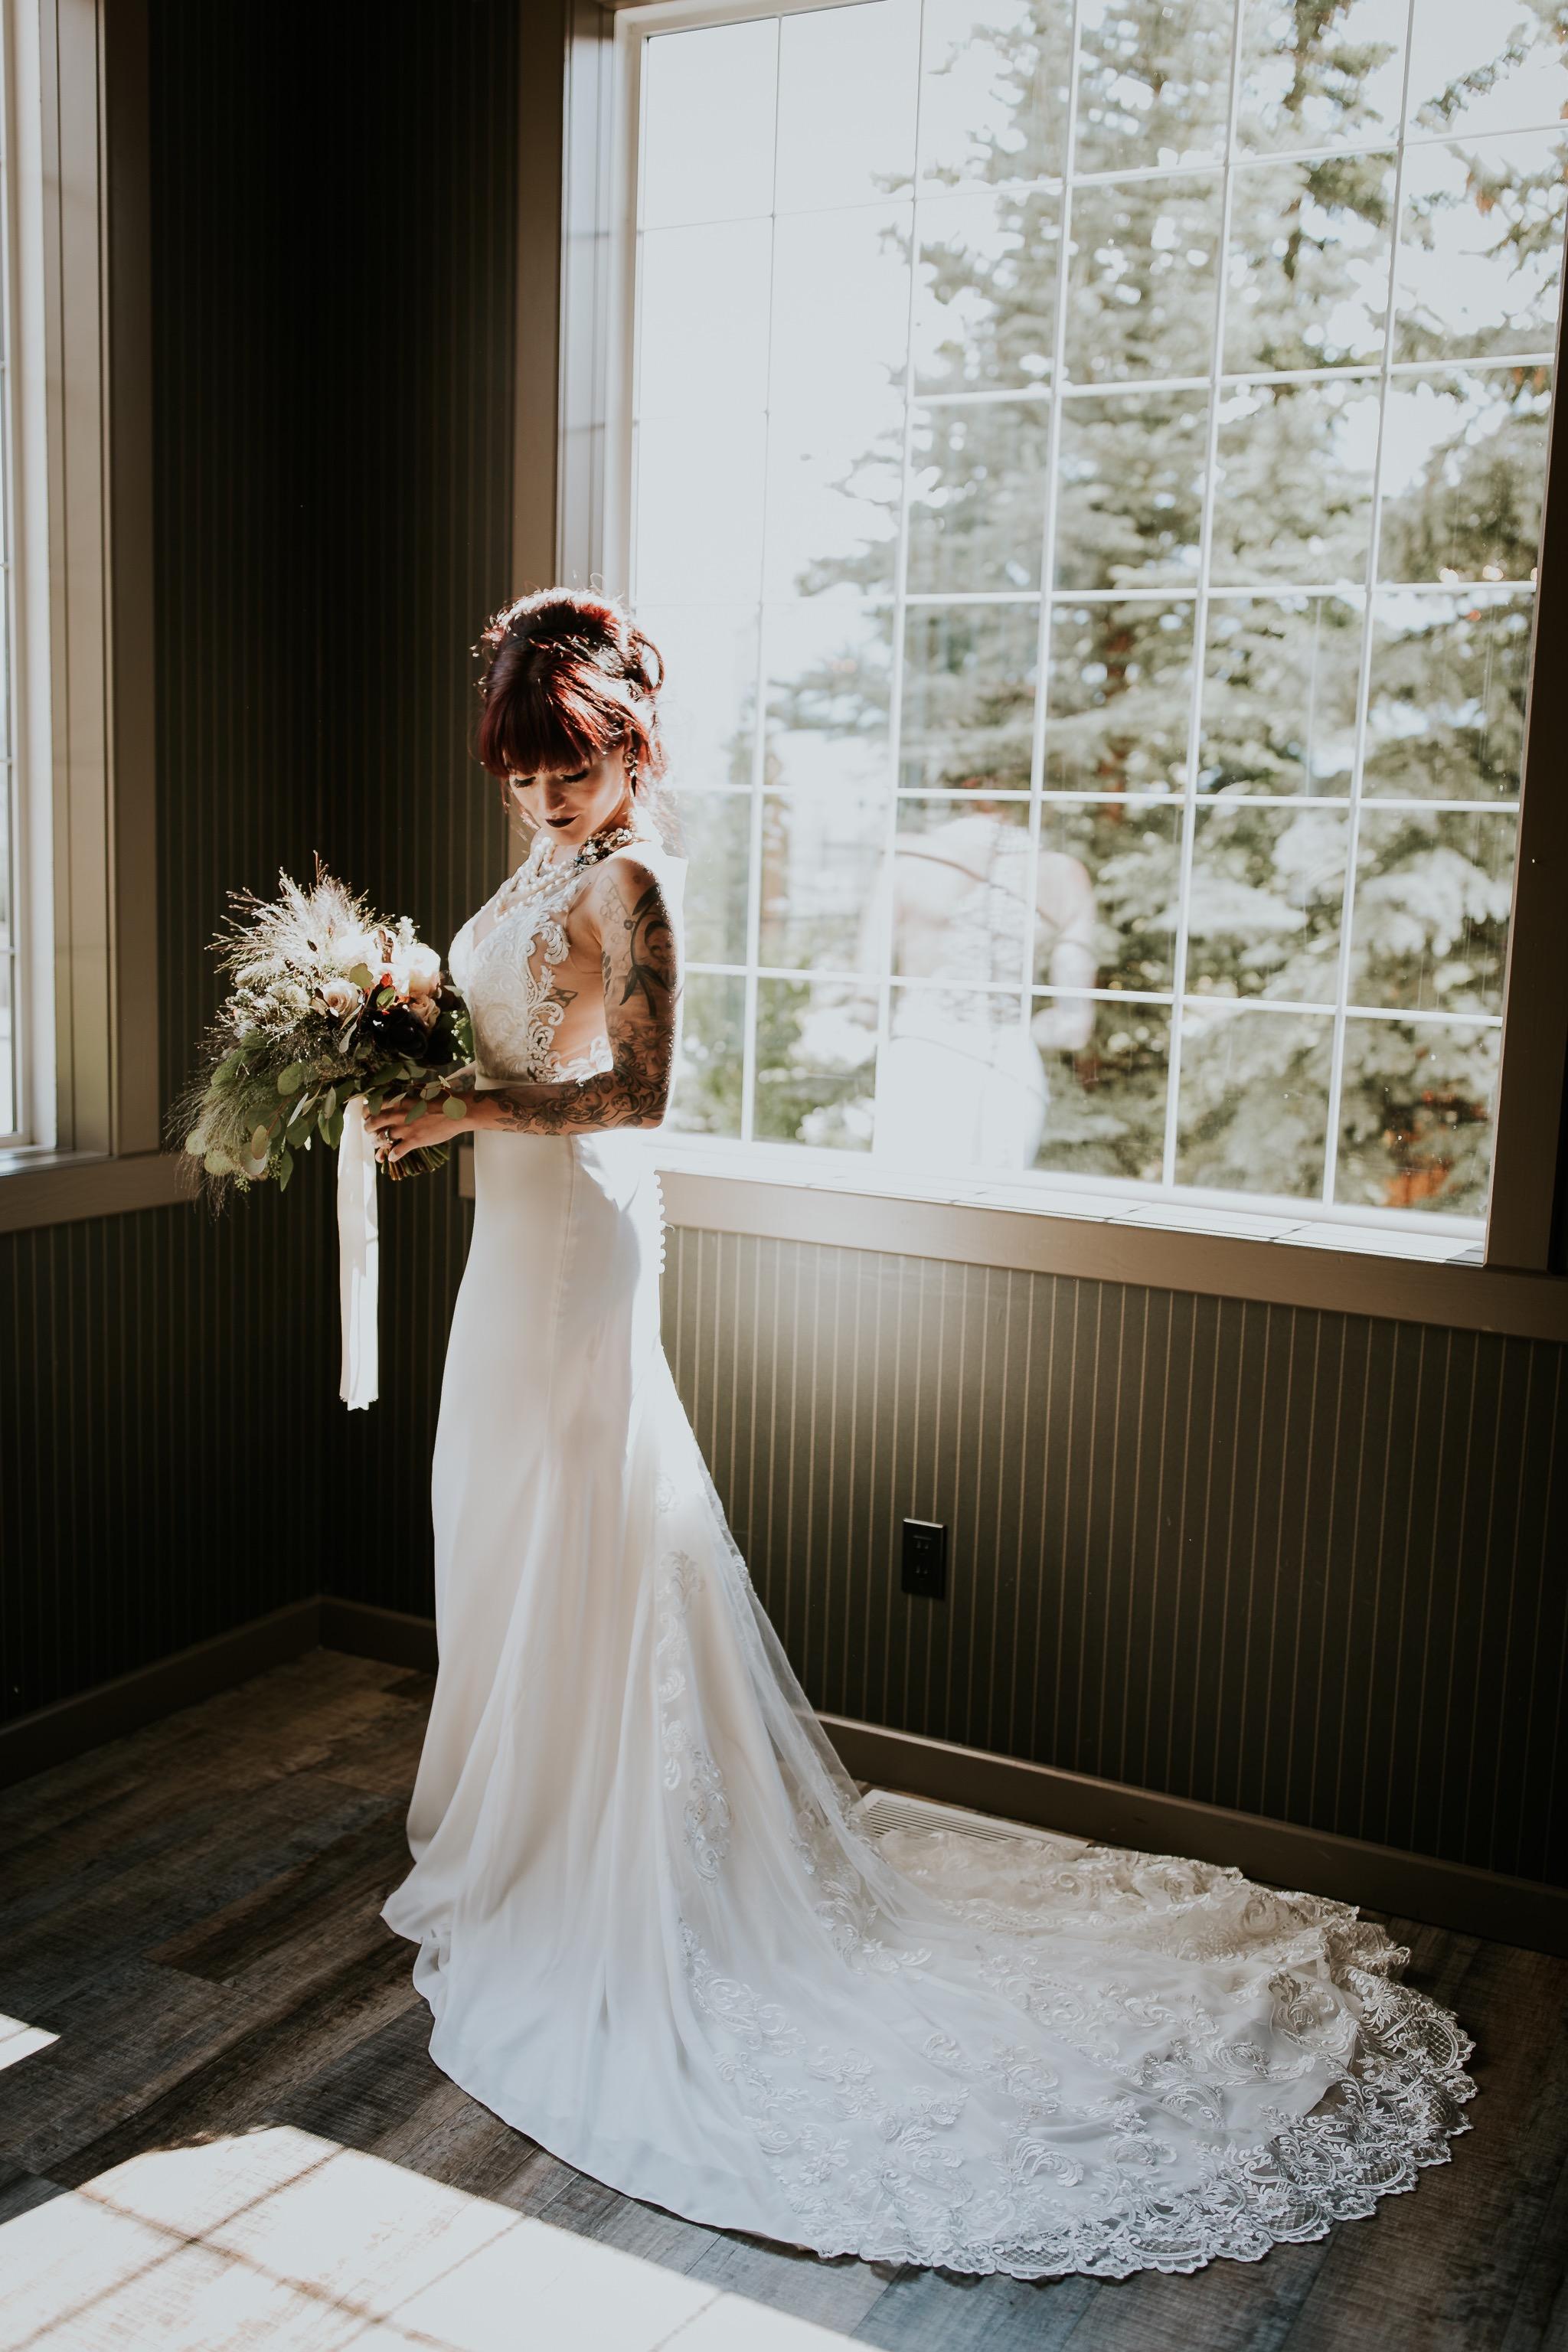 20170915-canmore-moody-wedding-photographer-creekside-creeksidestyledshoot-time&fate-5468